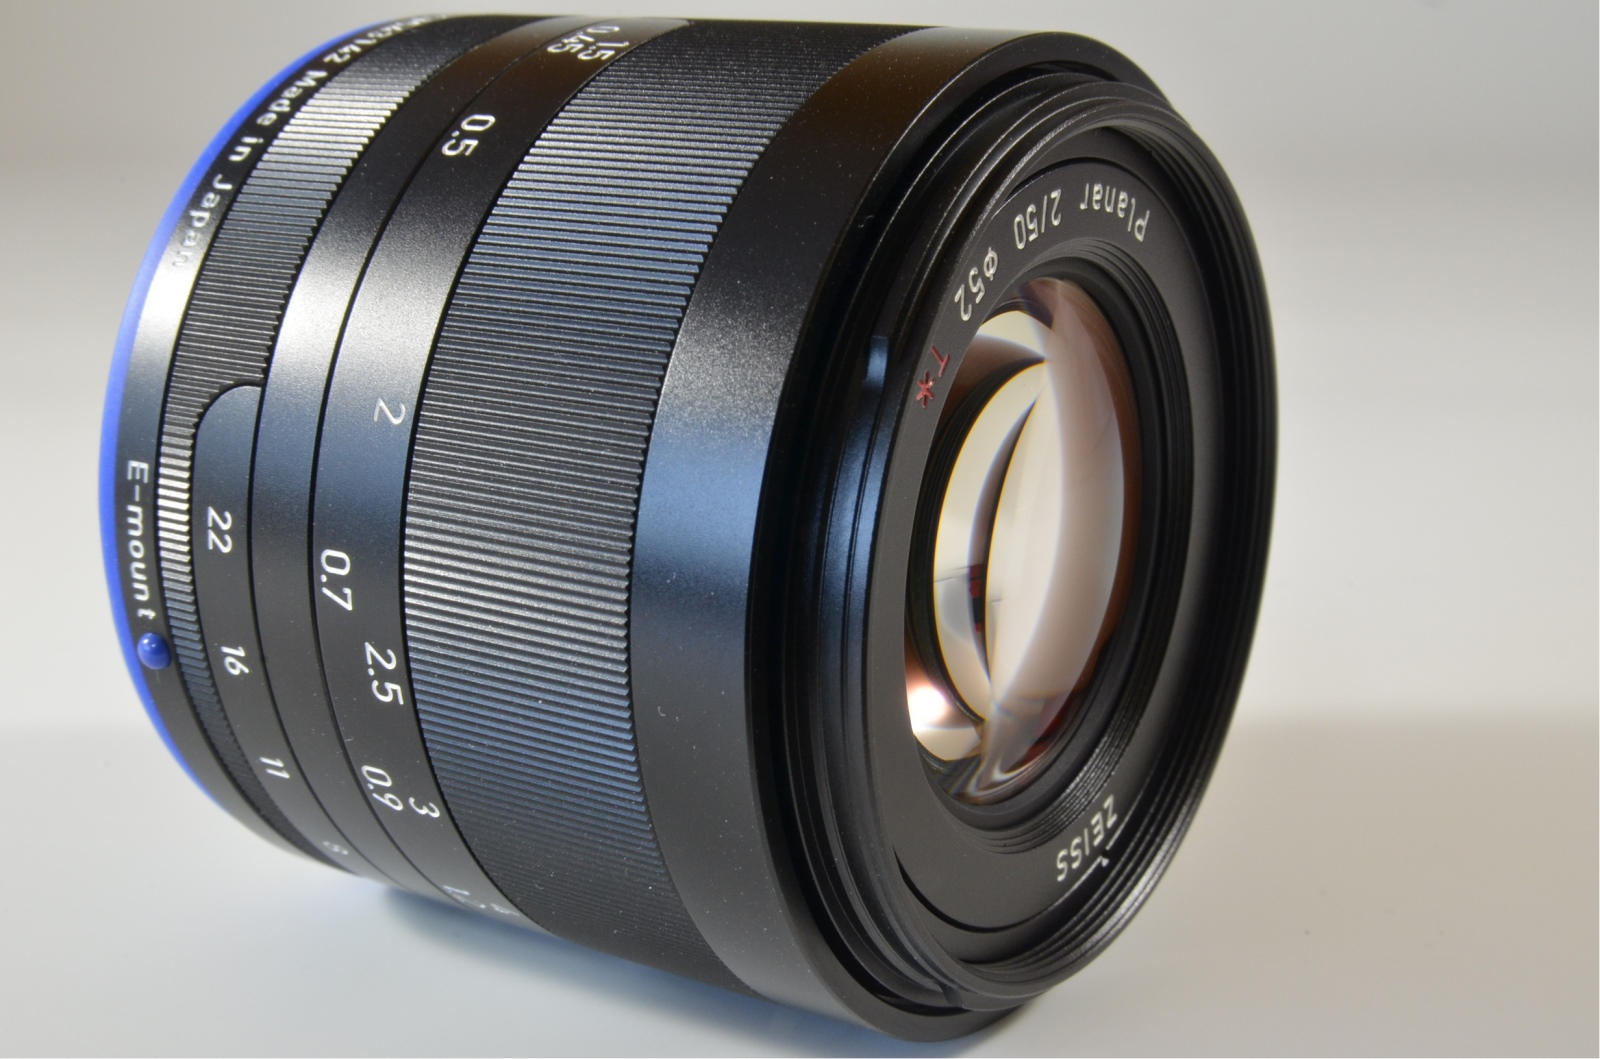 carl zeiss loxia 50mm f/2 planar t* lens sony e mount